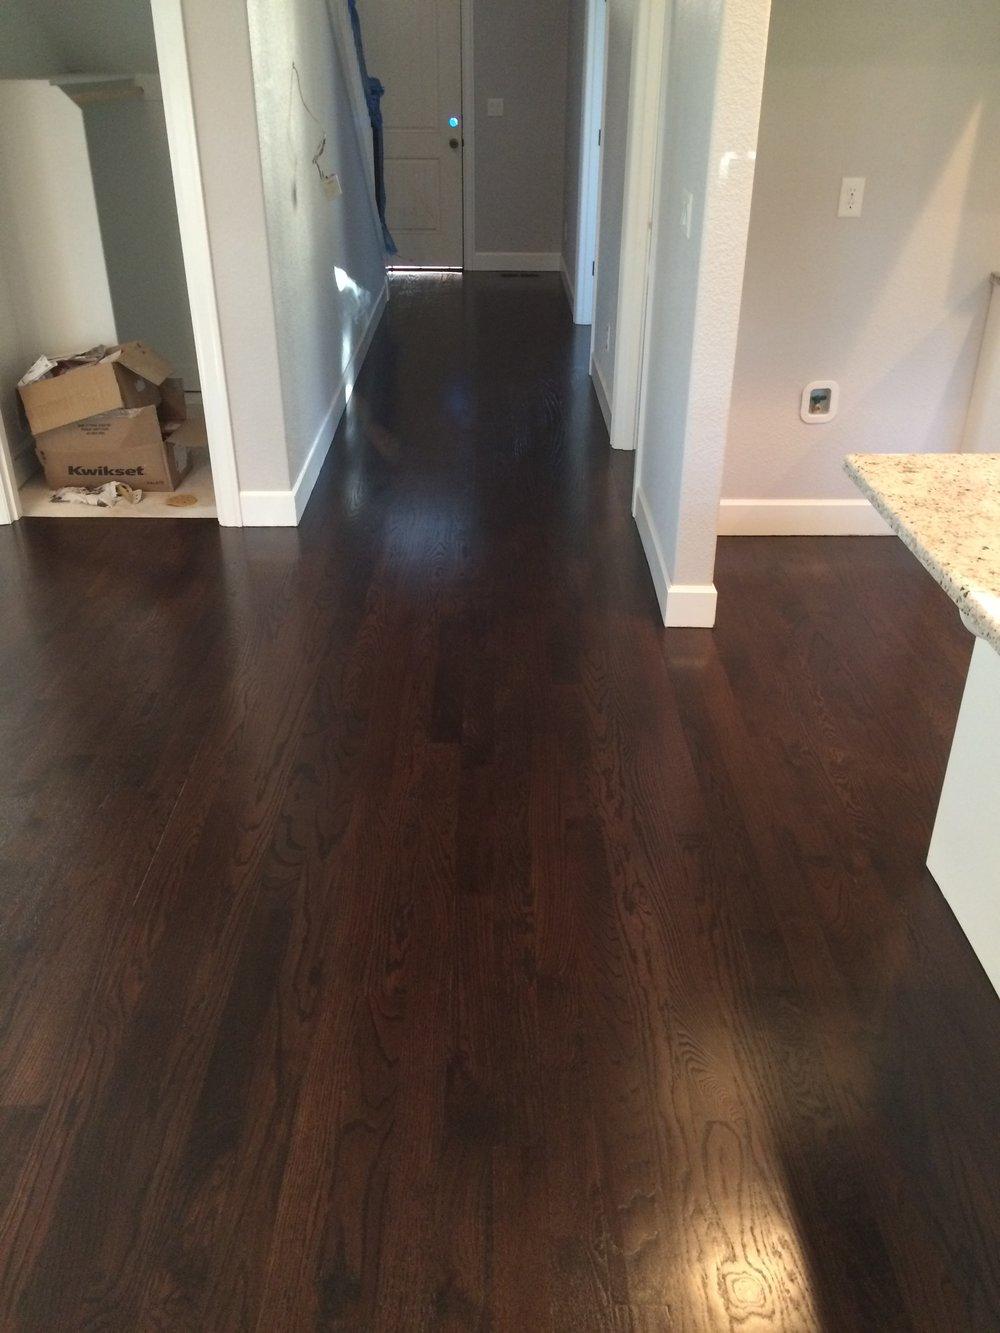 #1 White Oak Plank